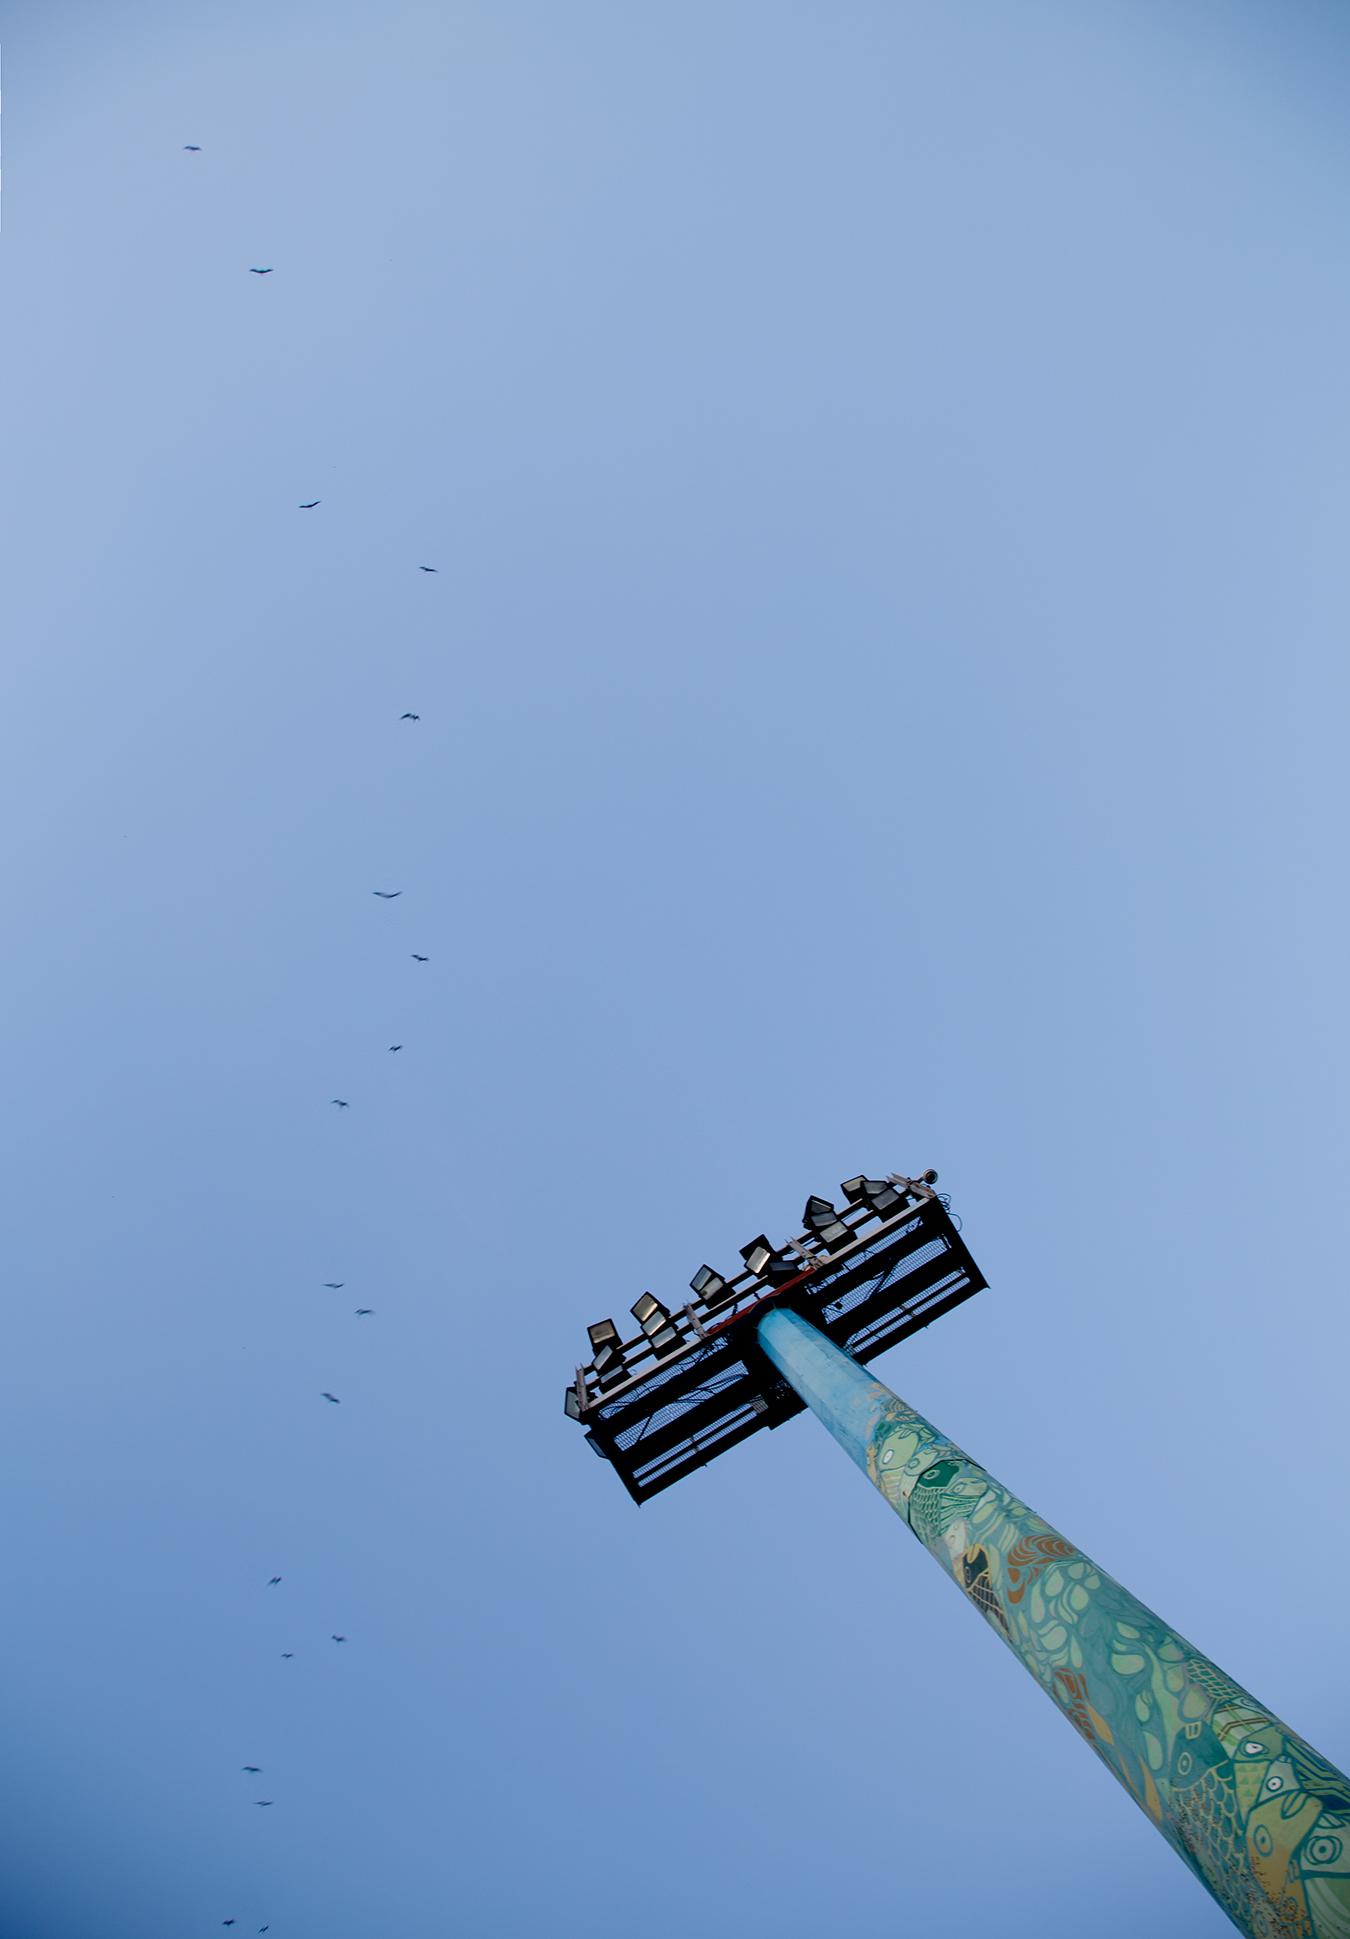 Rongrong Liu_Brazil_Rio De Janeiro_Blue_Tower_Birds_Mininalism